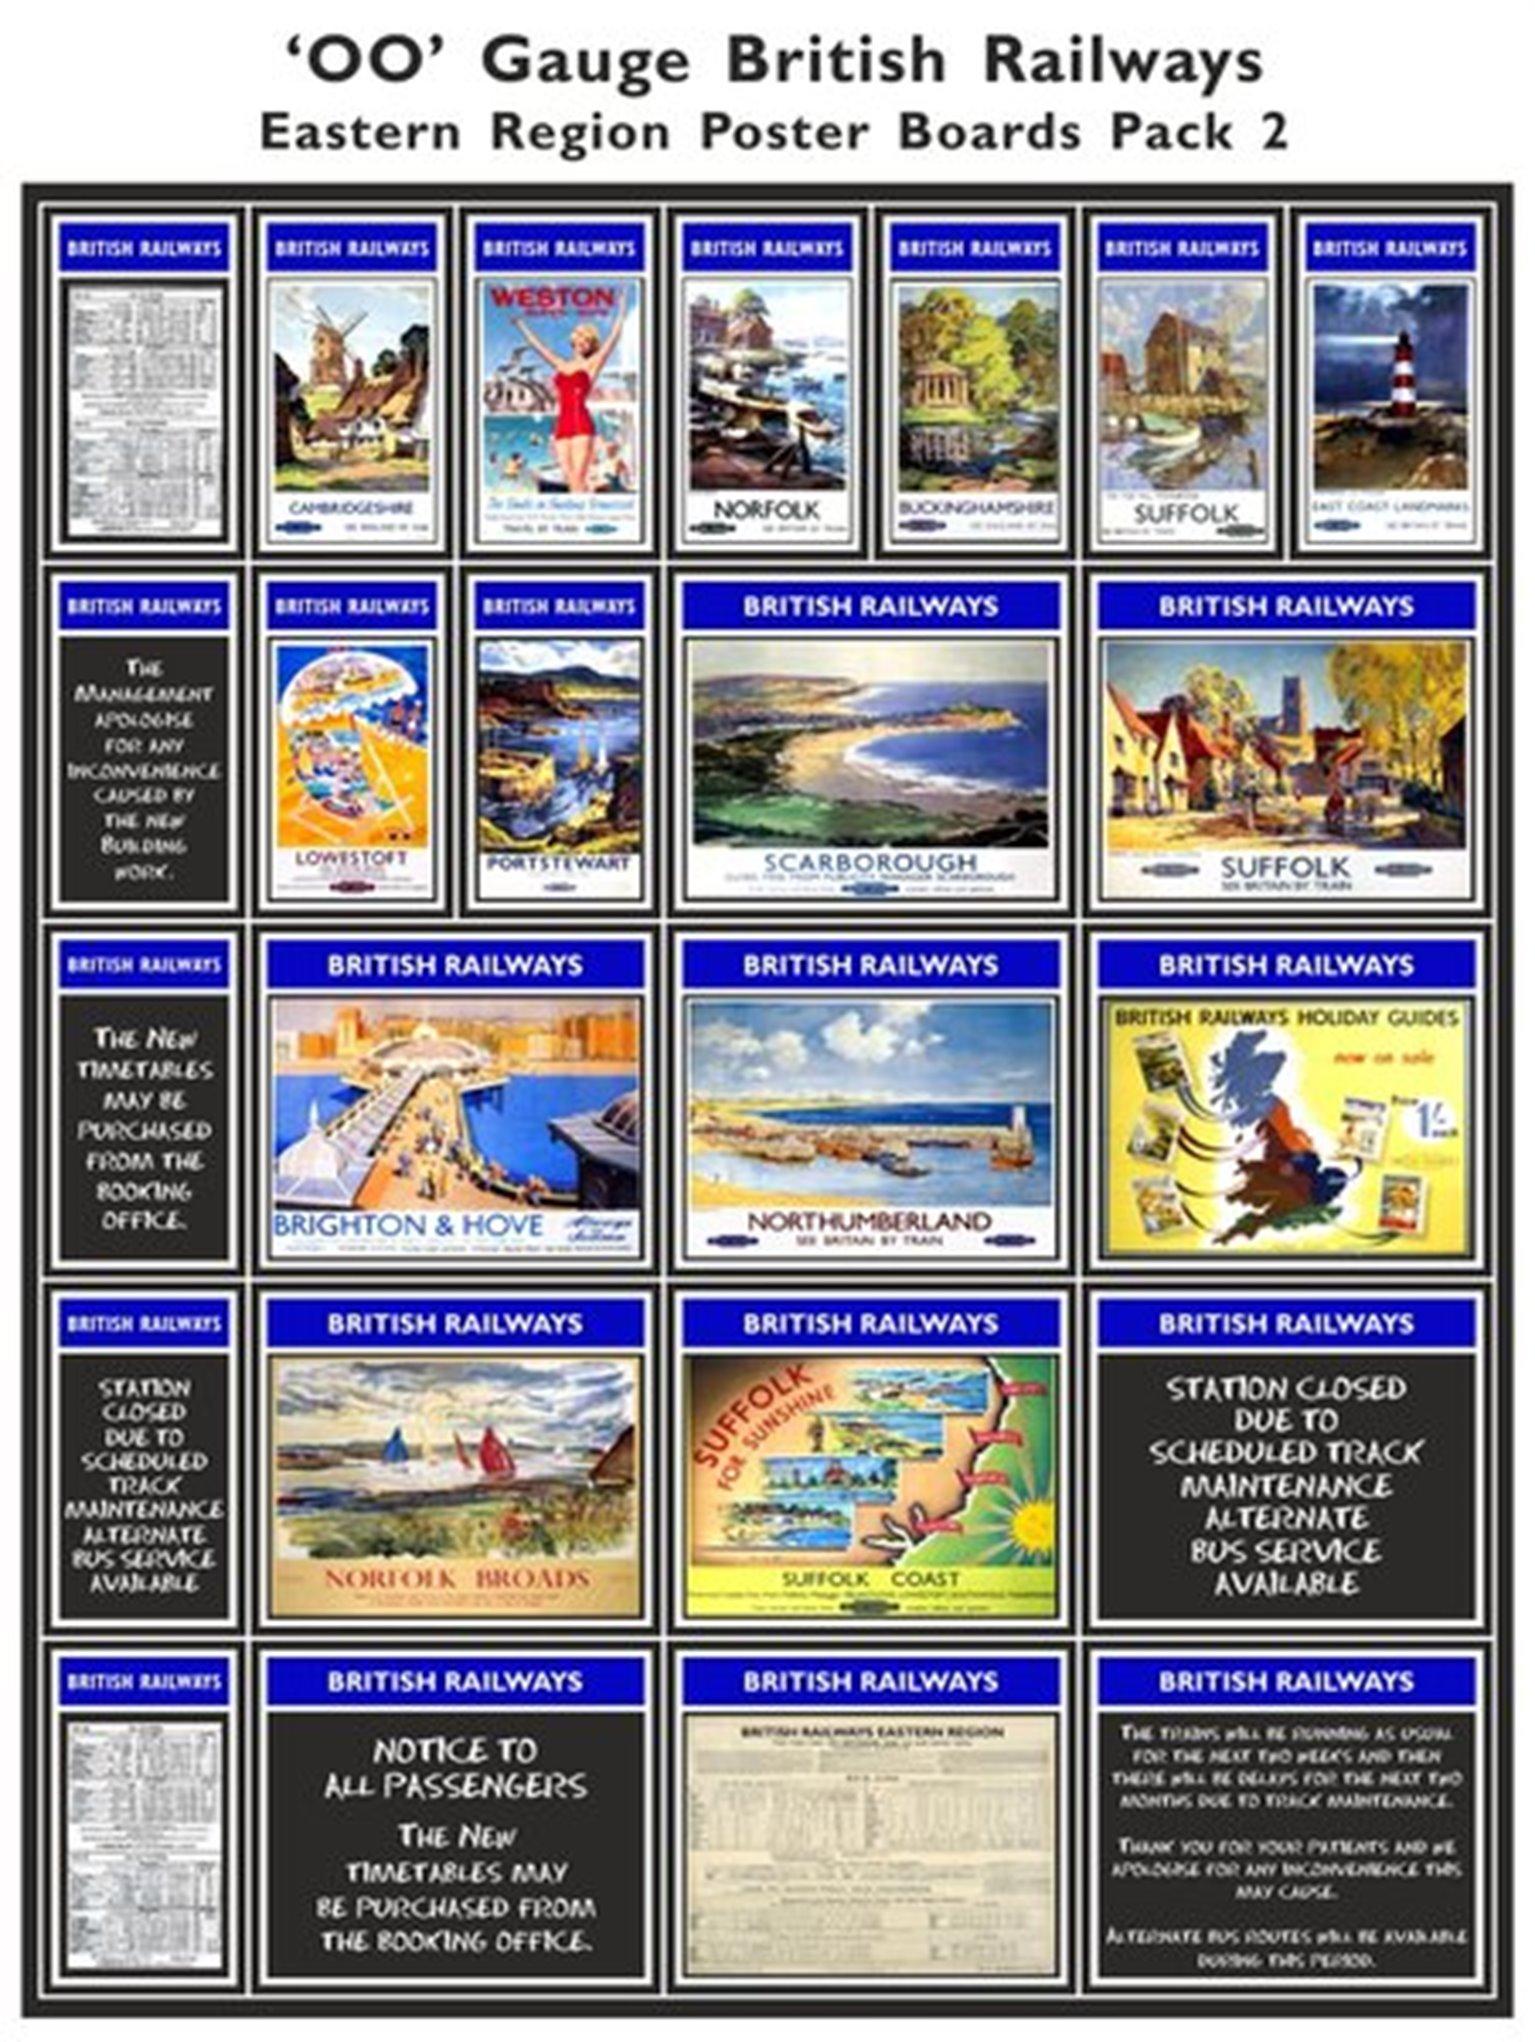 British Railways Eastern Region Poster Boards Pack 2